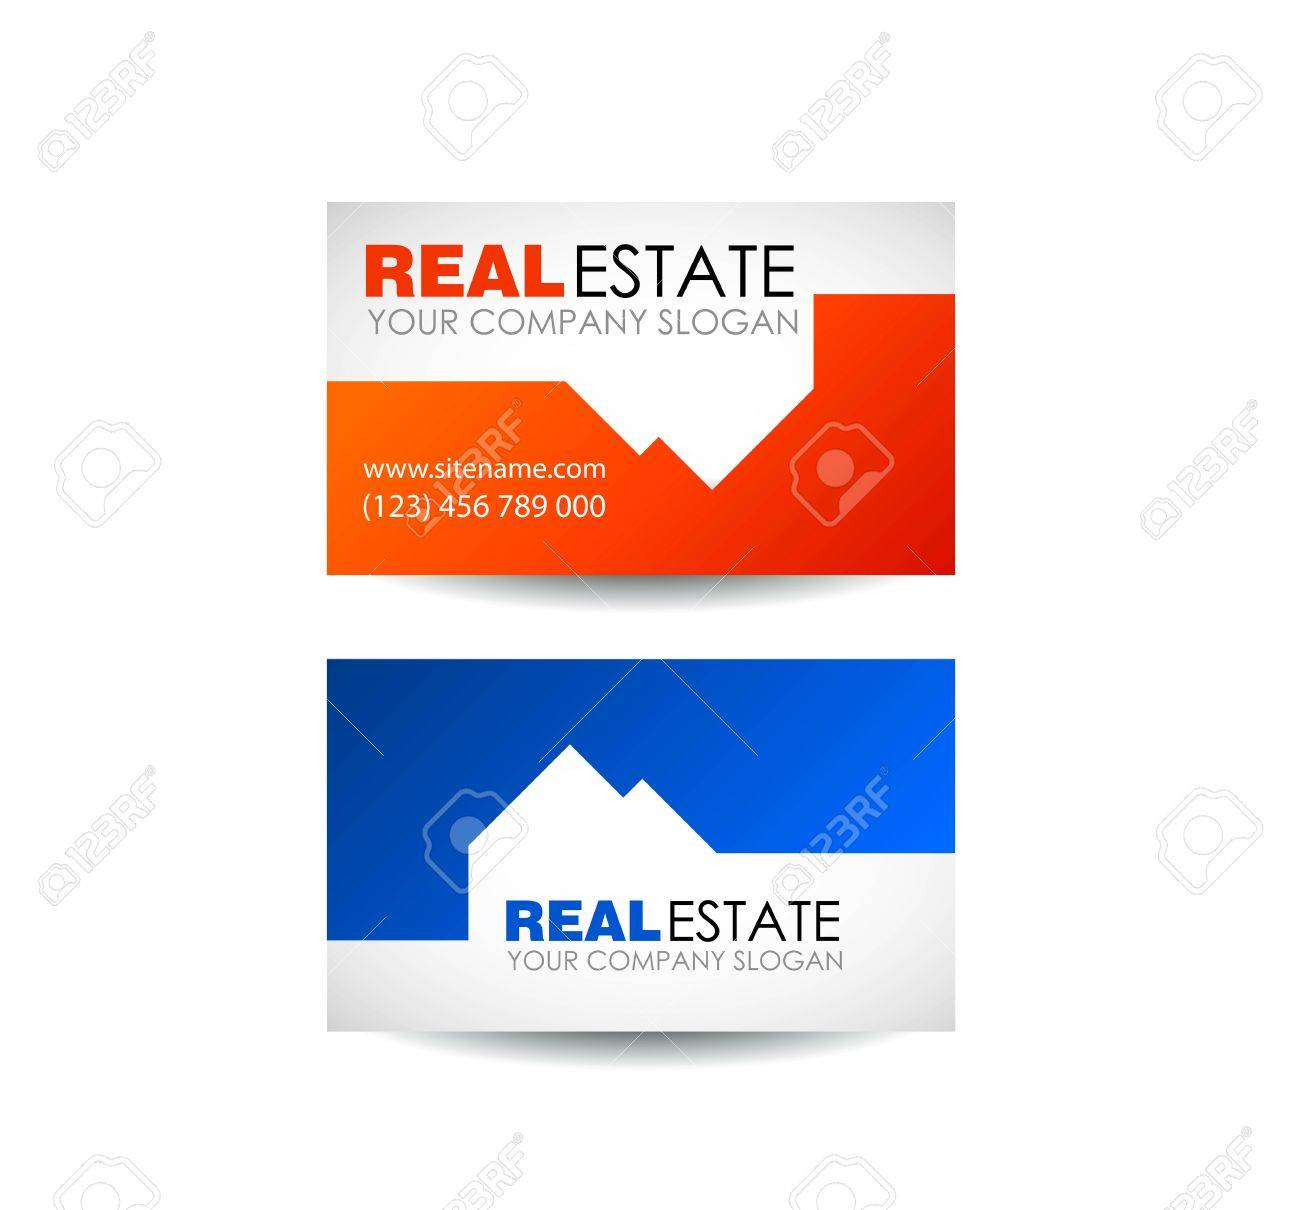 Real estate logo design real estate business company building architecture real estate logo design real estate business company building logo real estate design reheart Image collections